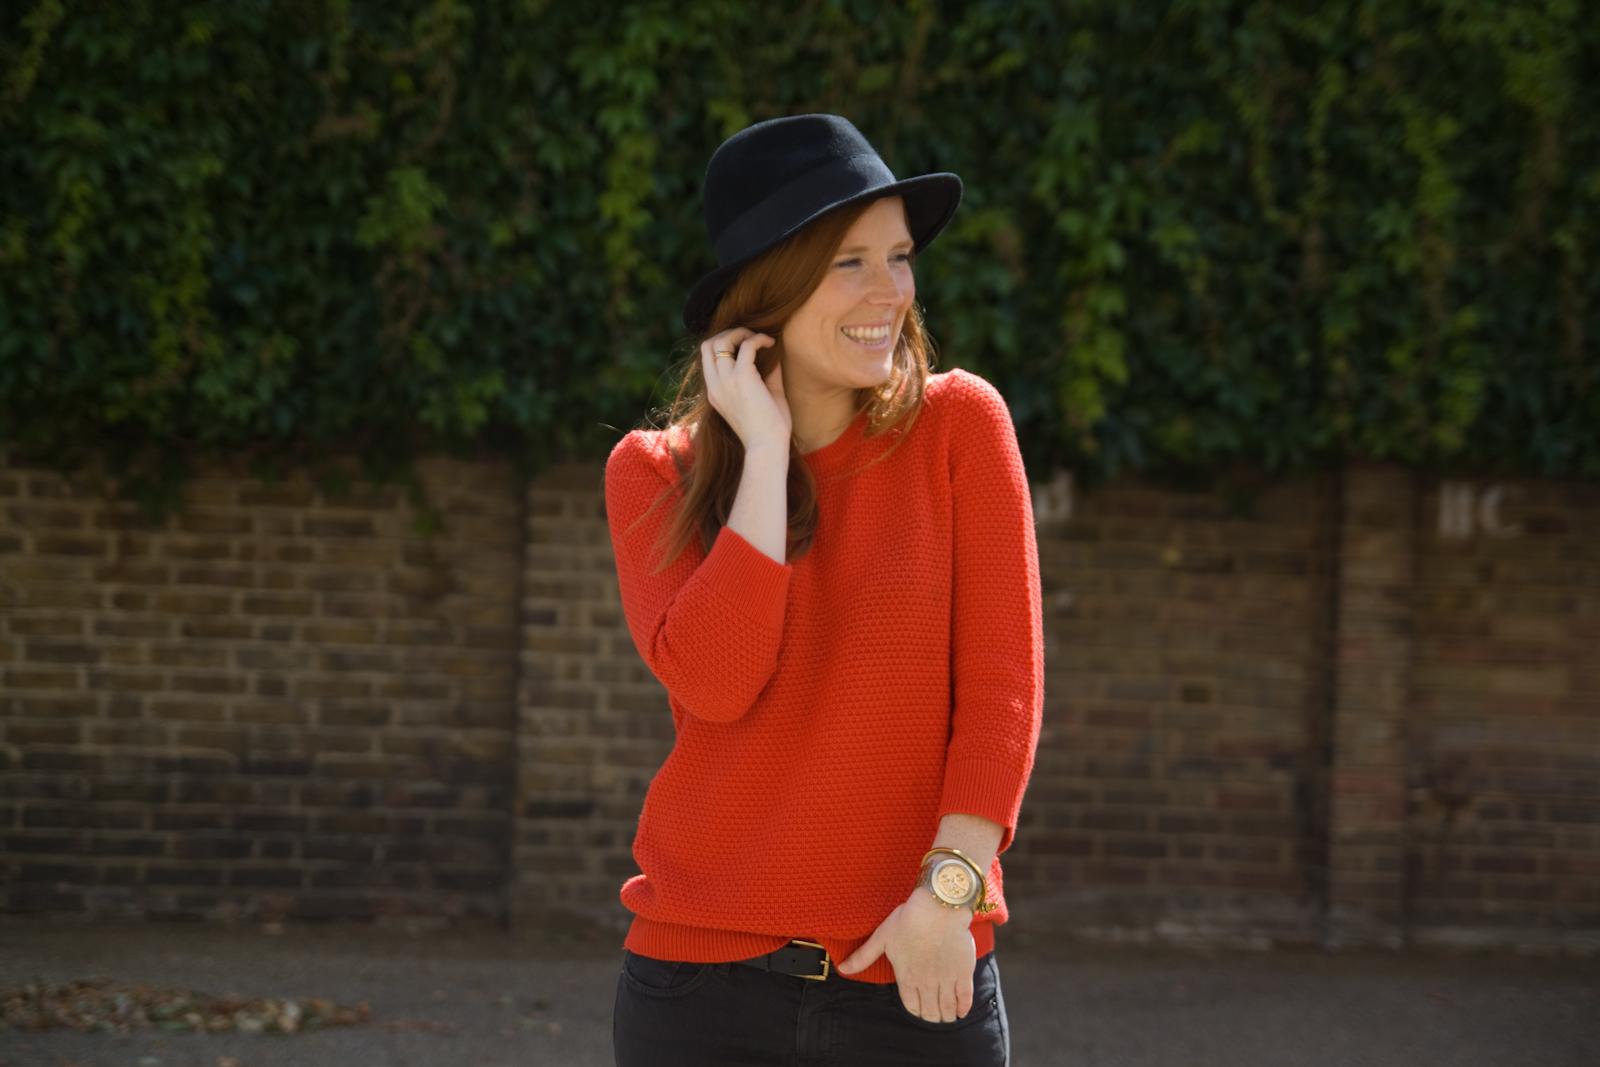 Gap  Jumper /  H&M  jeans and hat /  Zara  sandals